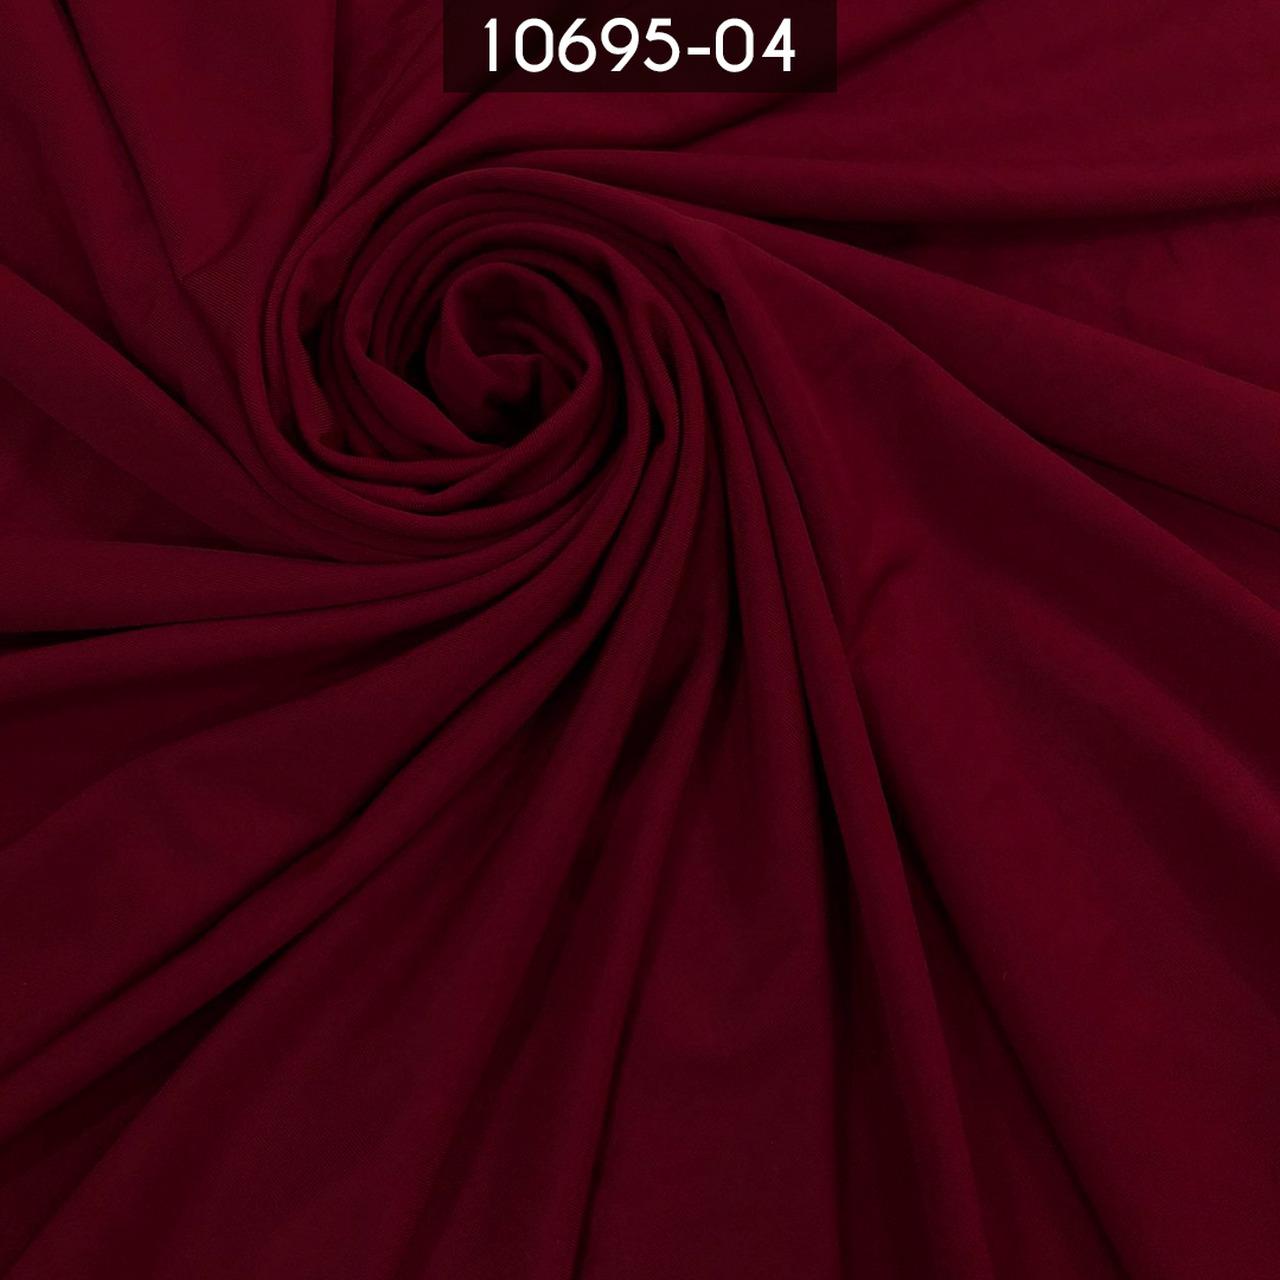 Tecido Malha Liga Light 10695 96%Poliéster 4%Elastano Marsala